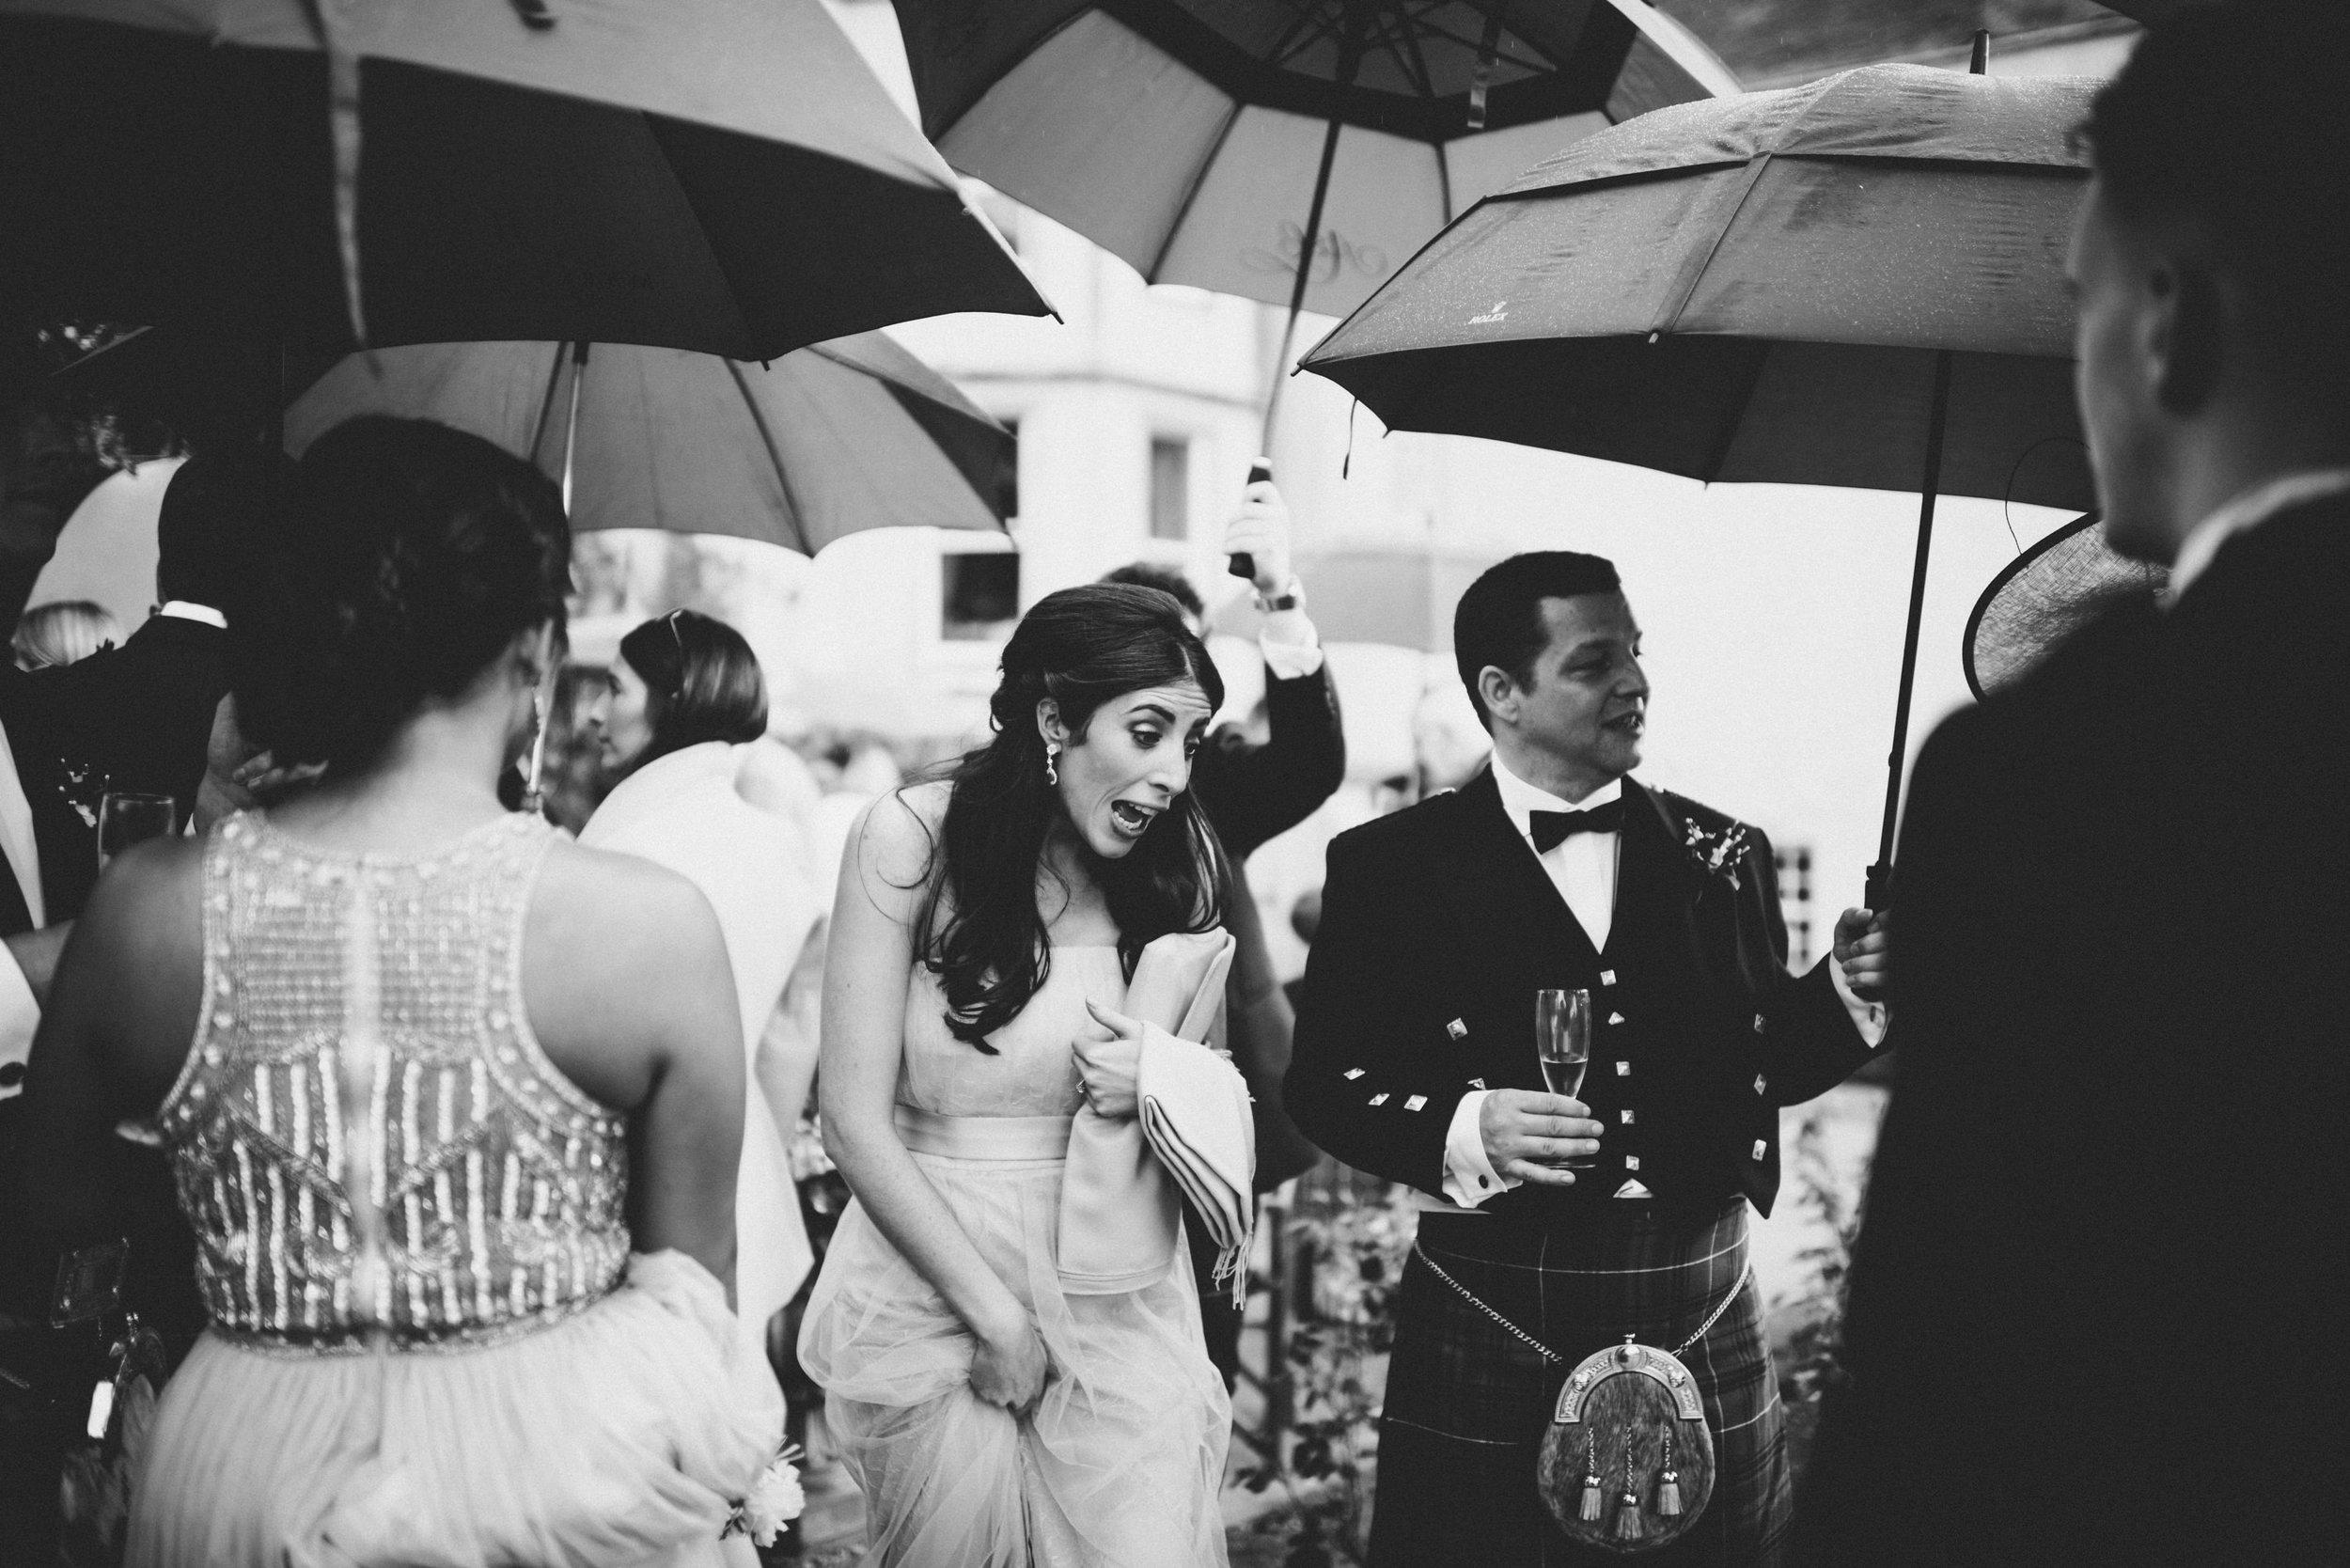 0191-alternative-wedding-portrait-family-kids-photographer-glasgow-scotland.JPG